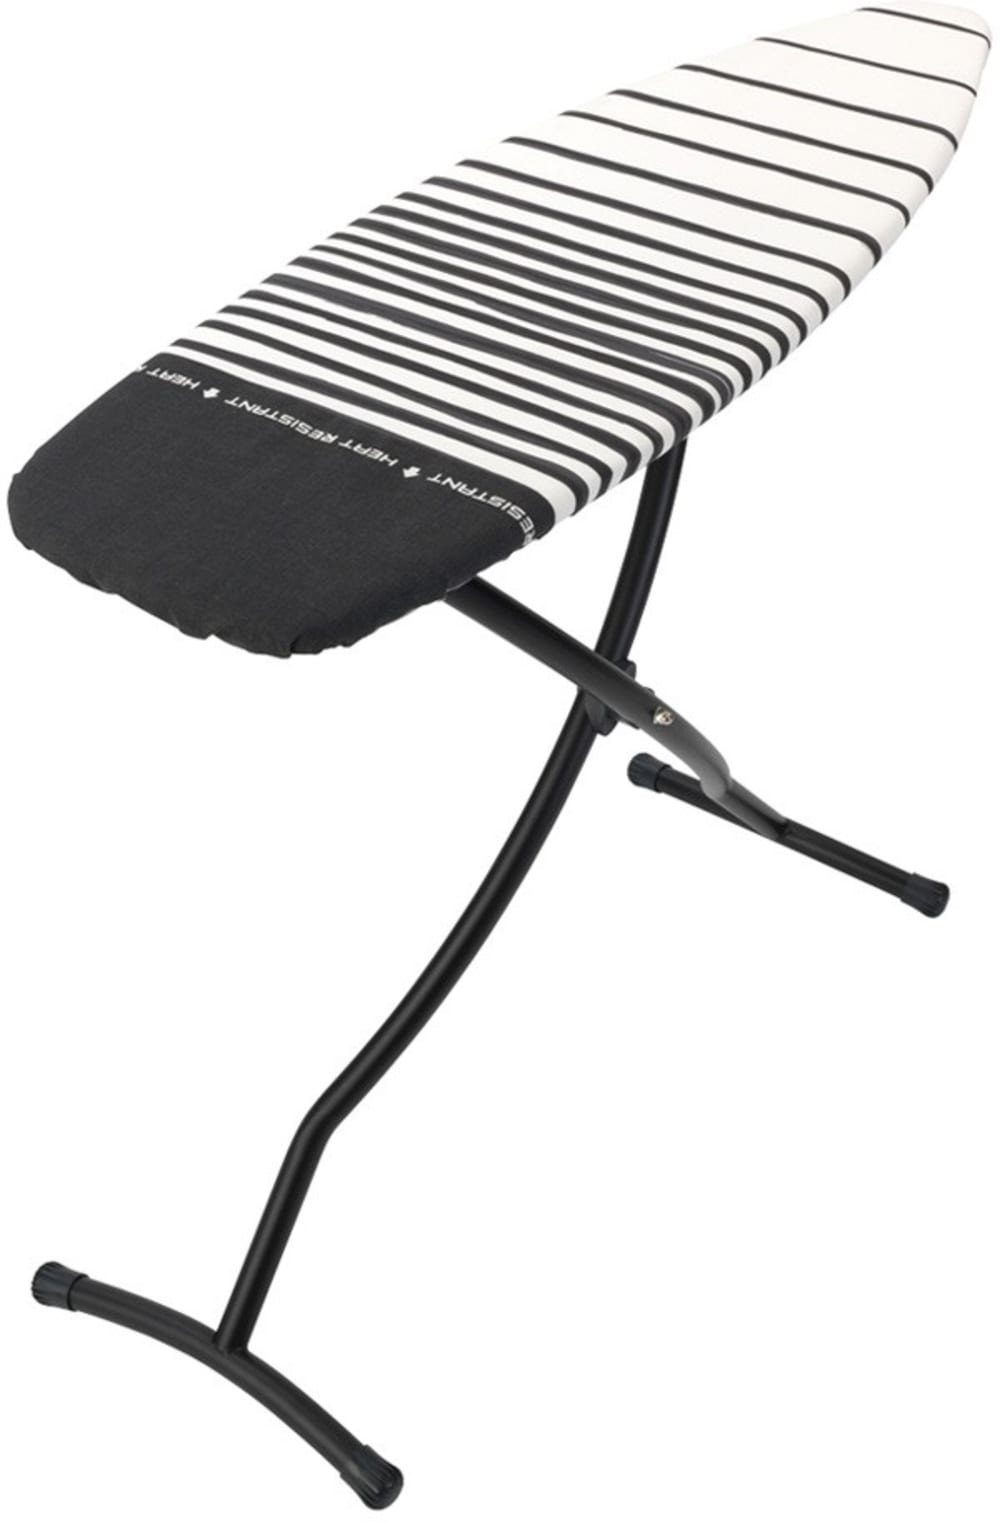 BRABANTIA - Deska do prasowania 135 x 45 FADING LINES, rama 35 mm